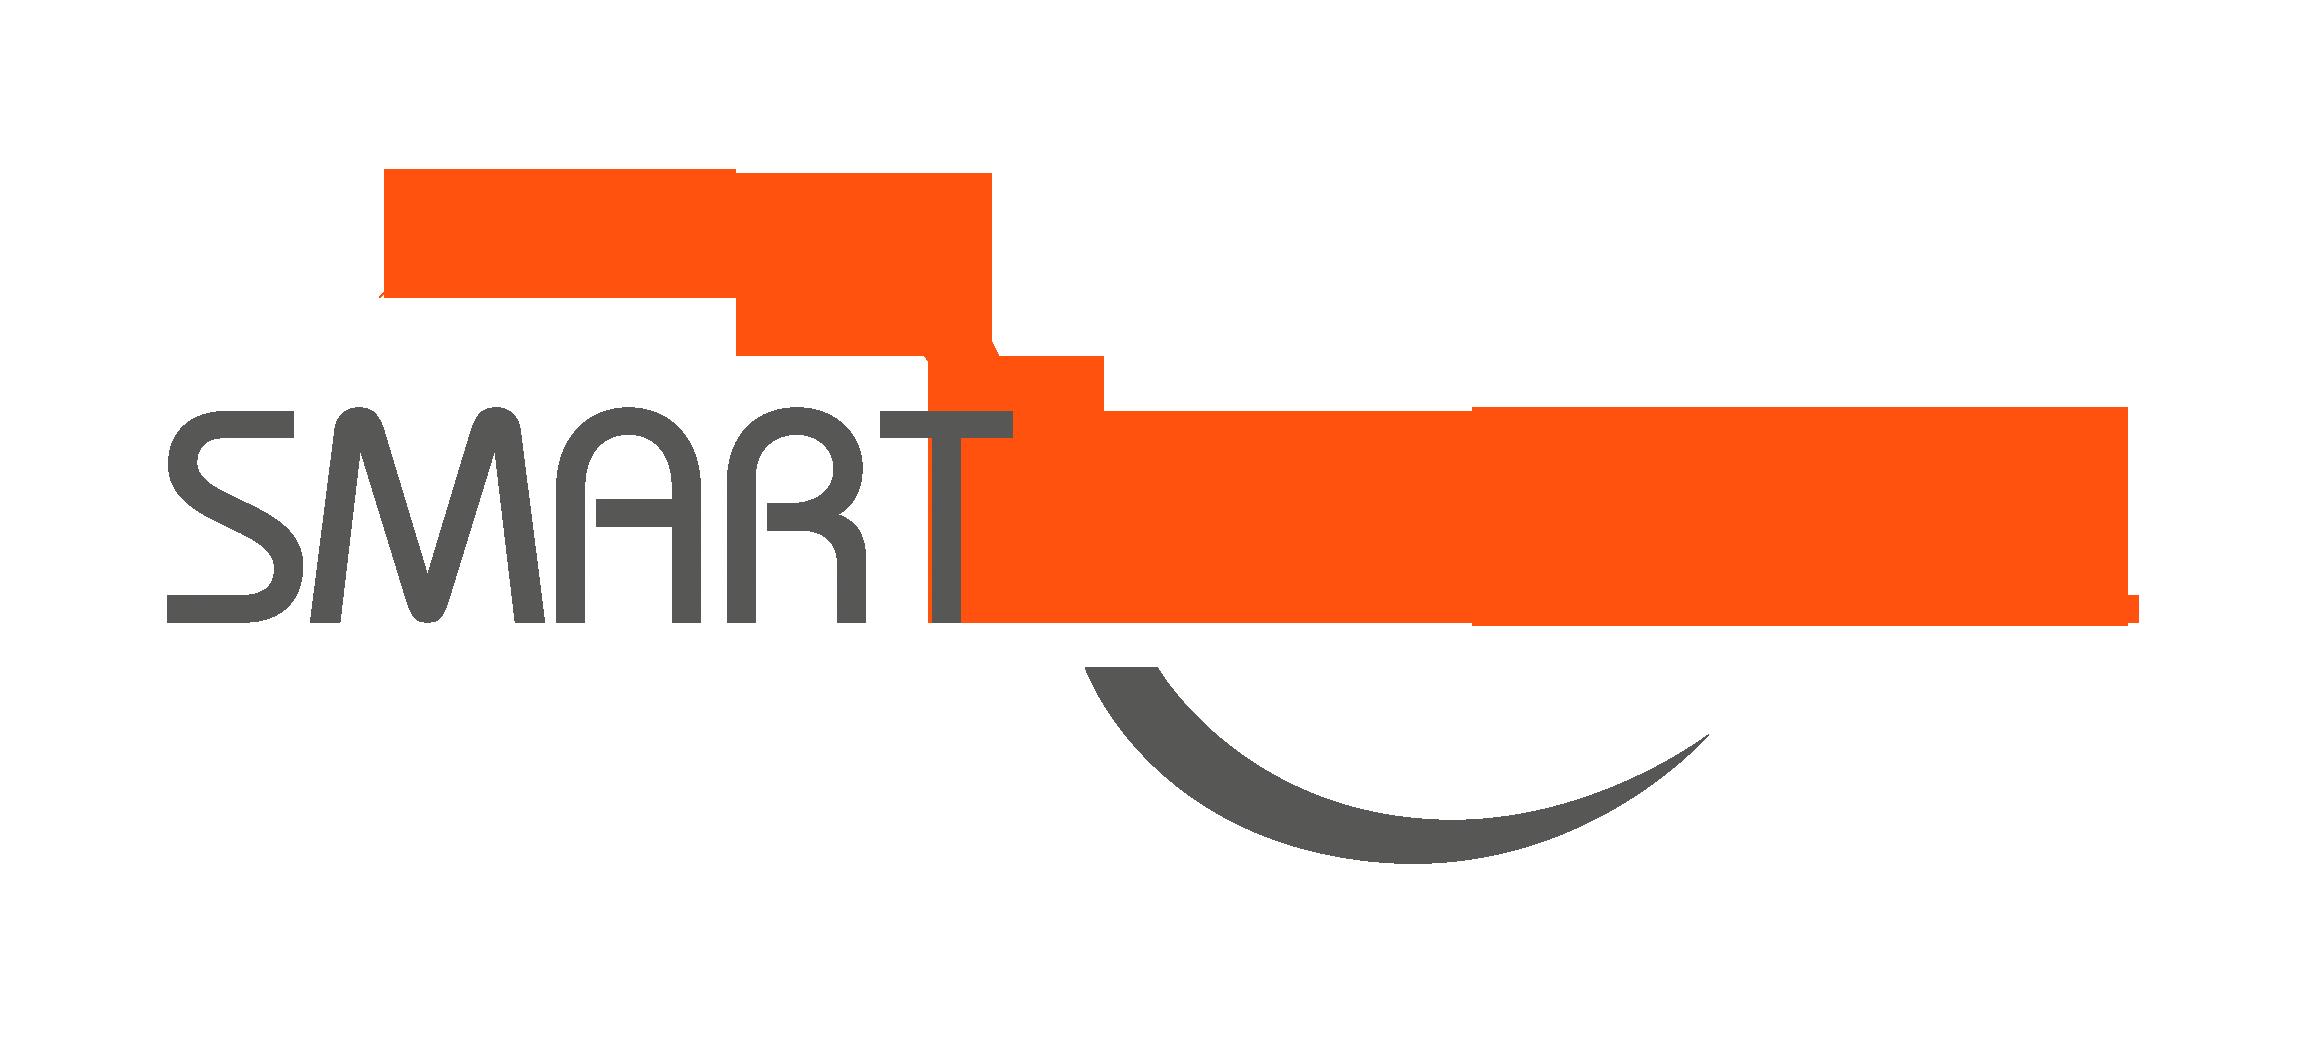 smartschool_logo_oranje_zwart